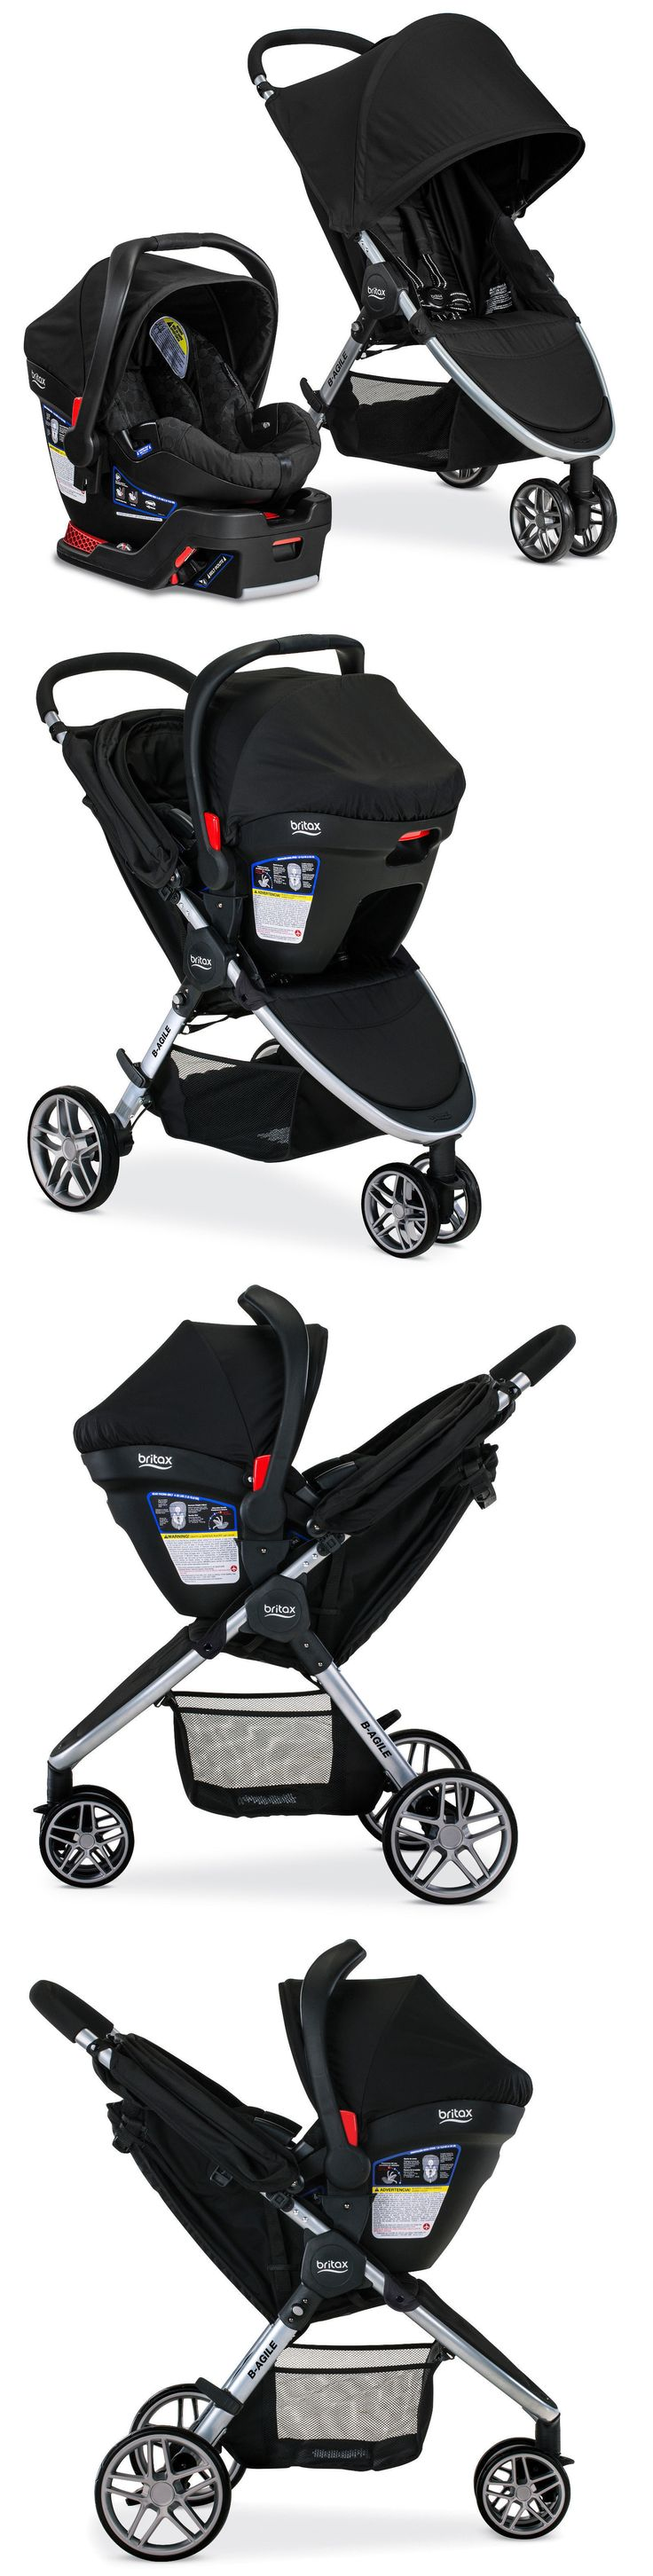 Baby Britax 2017 B Agile 3 Stroller And B Safe 35 Infant Car